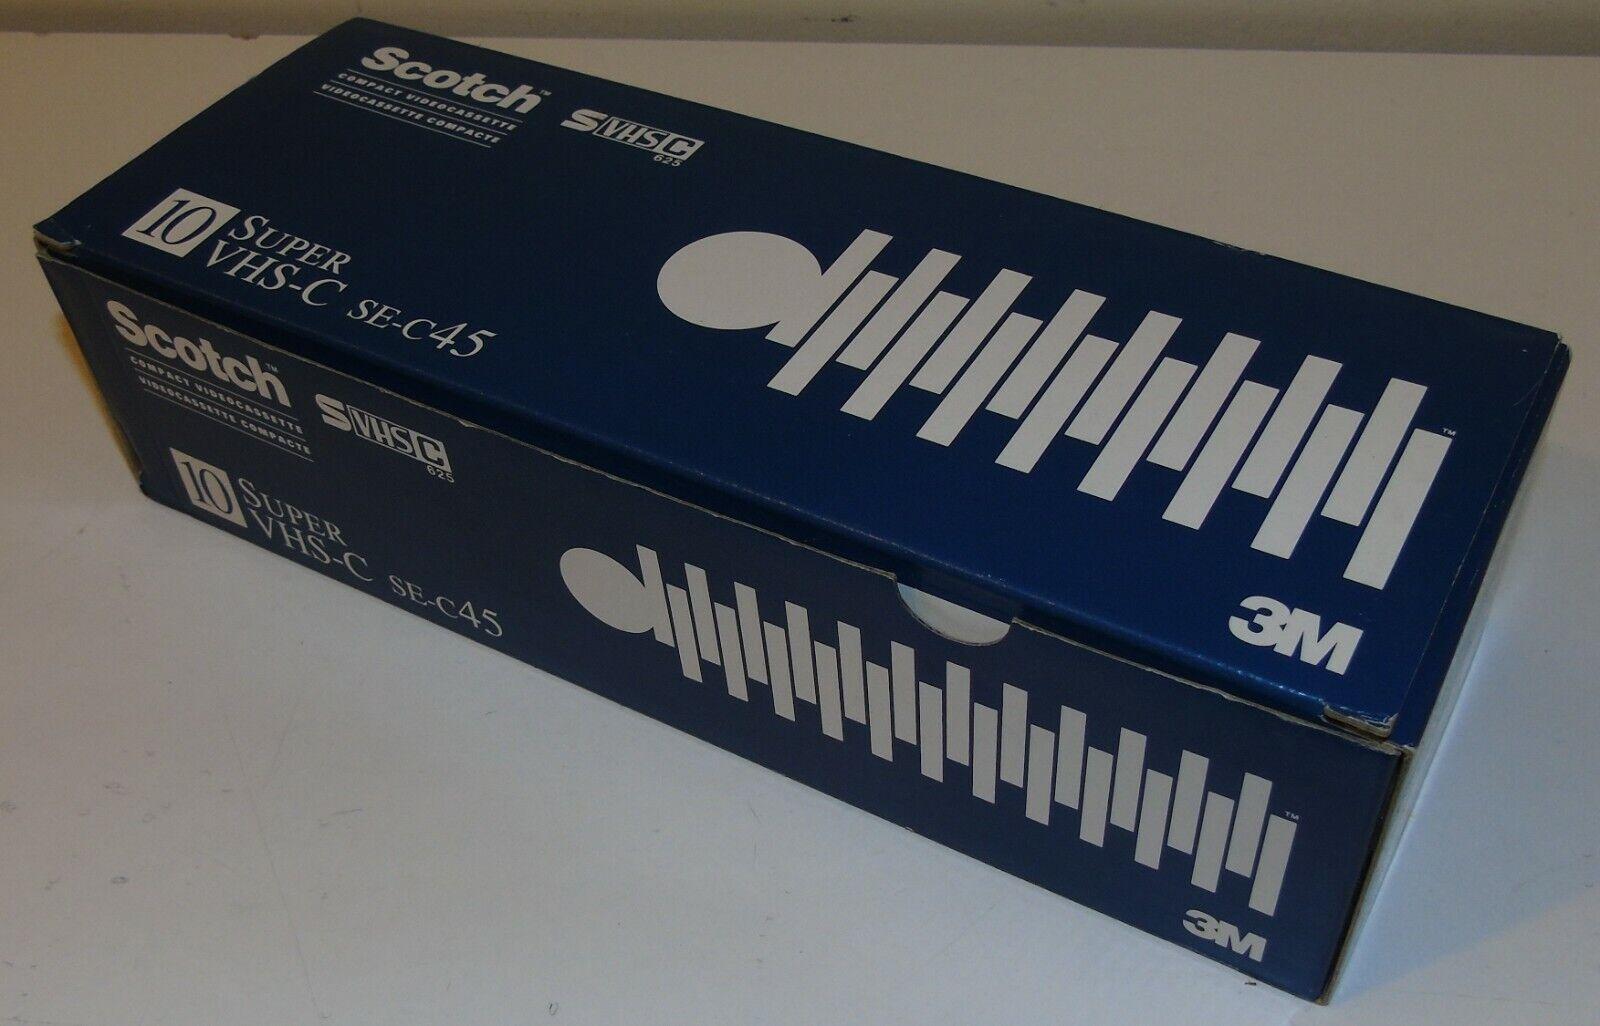 10 x Scotch Super VHS-C SE-C45 Camcorder Video Cassette Tape New & Sealed